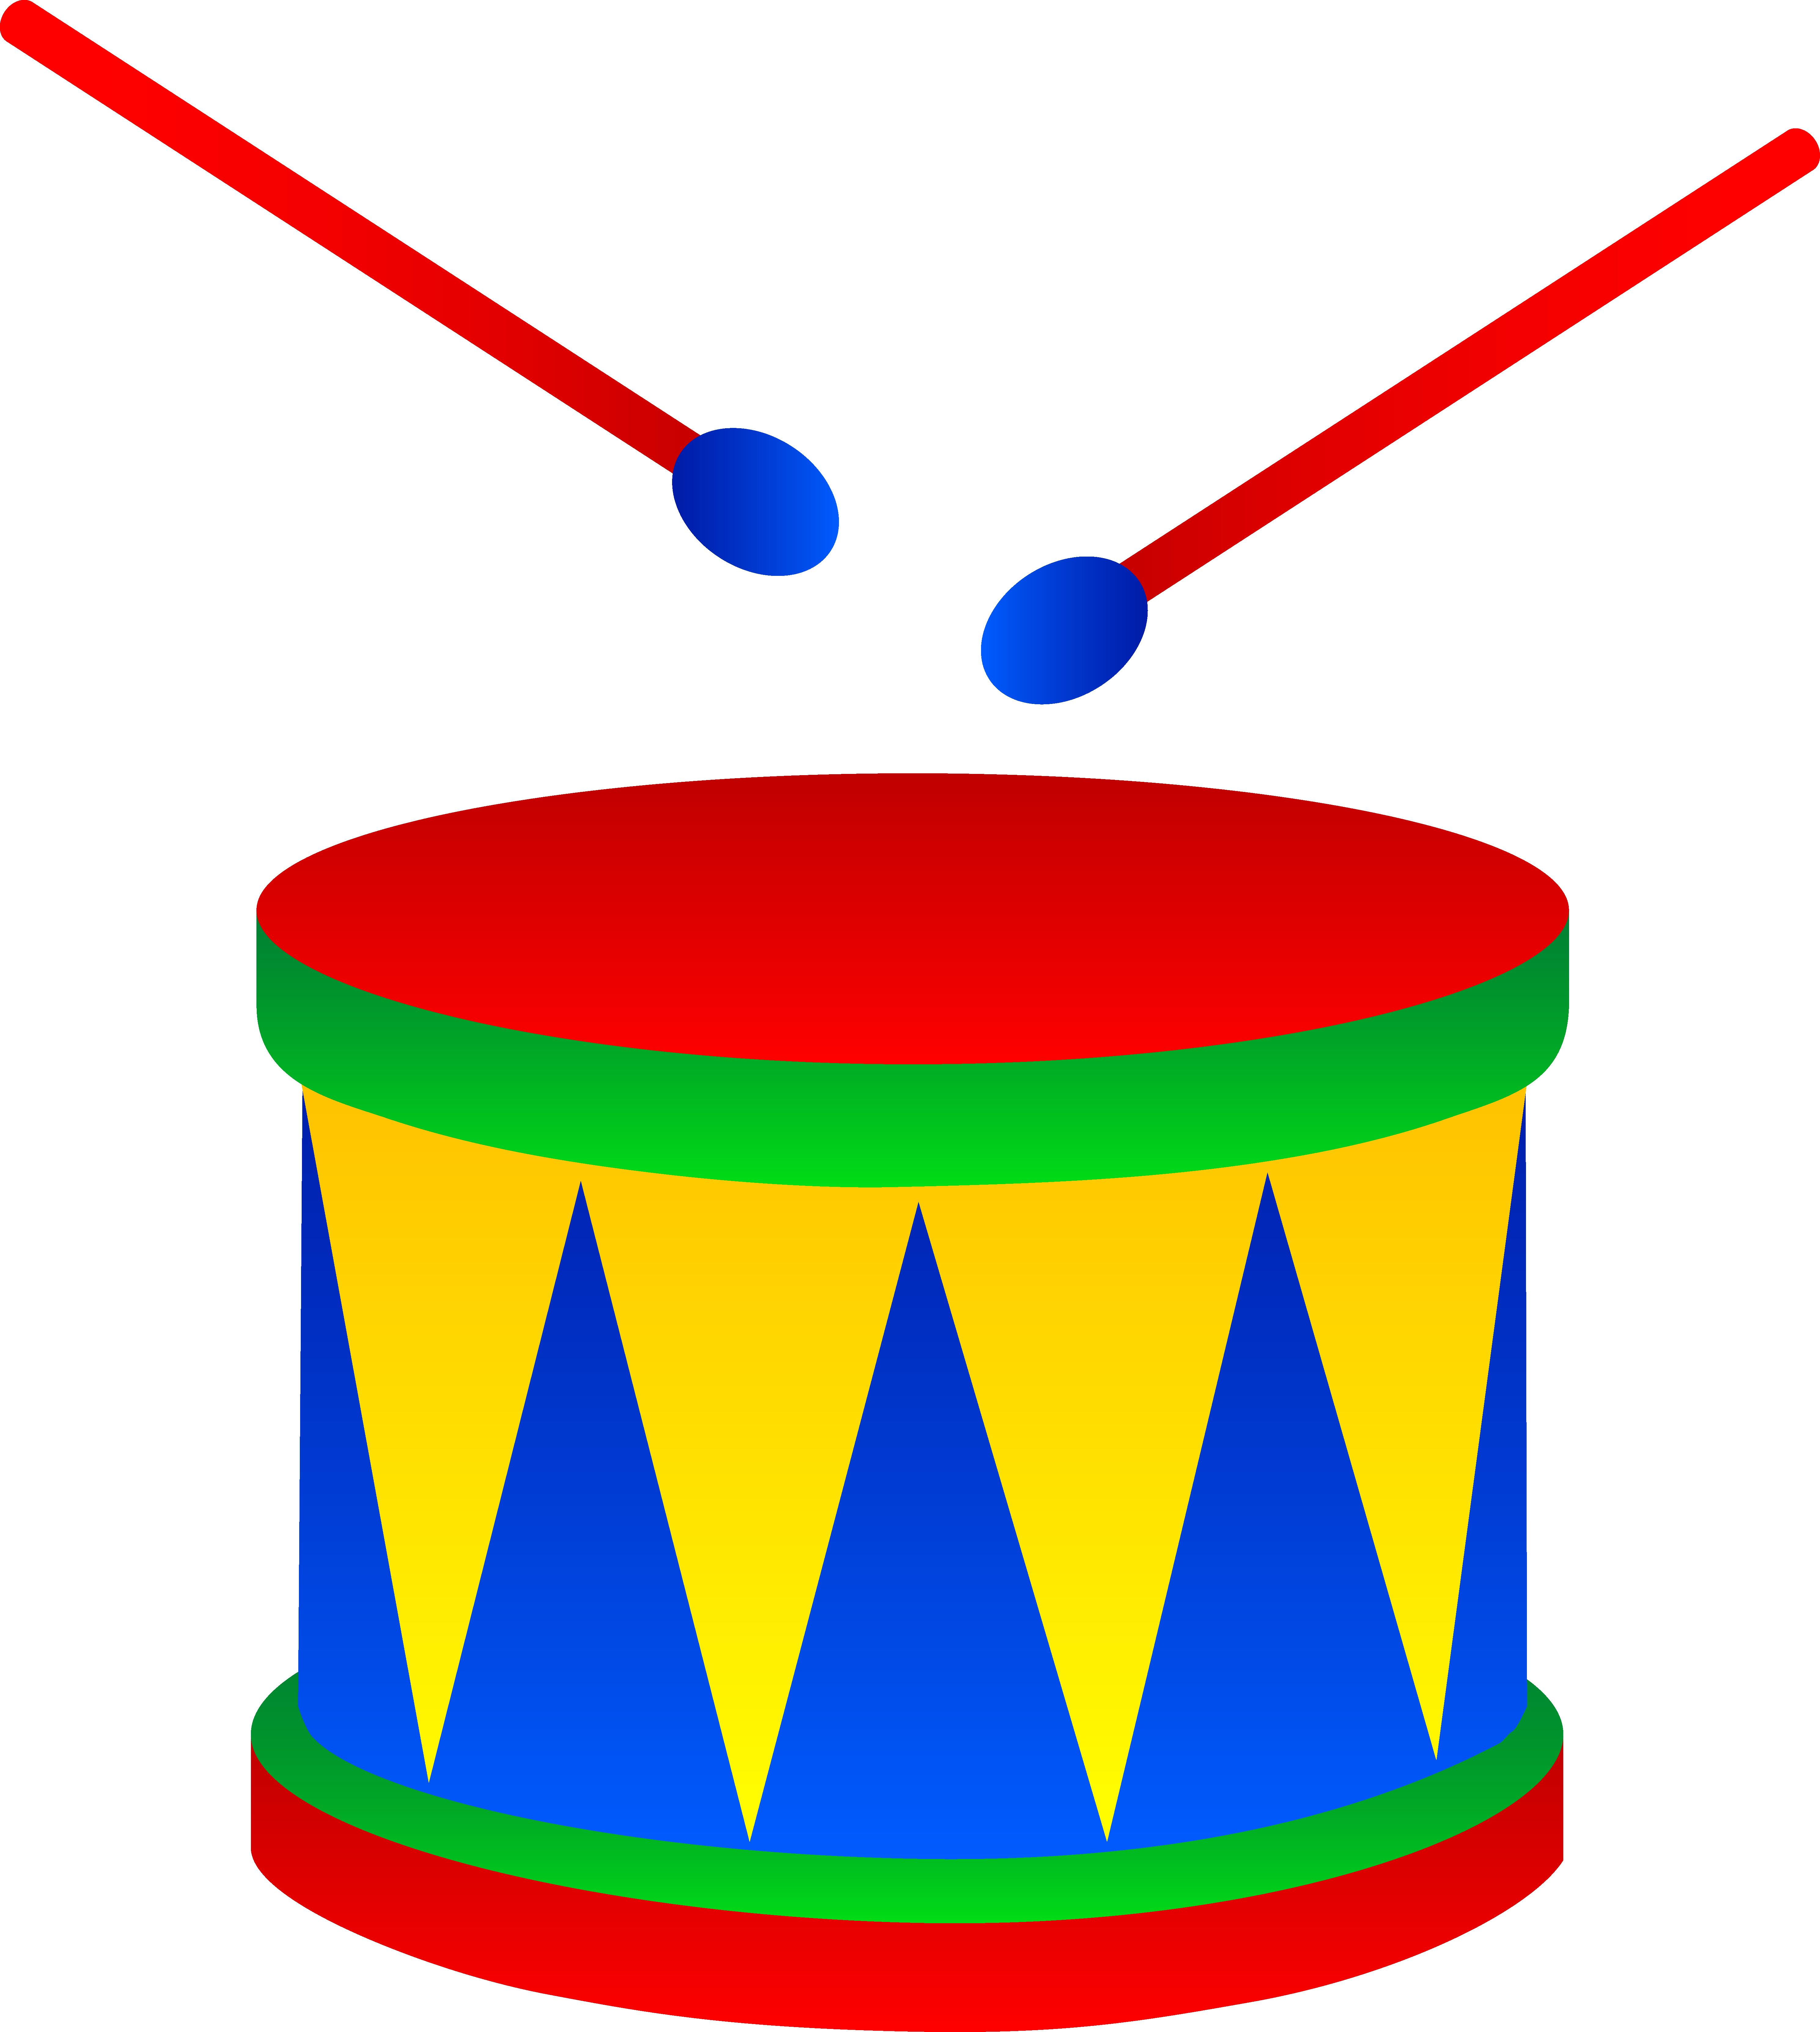 Drum clip art free. Hands clipart drumming